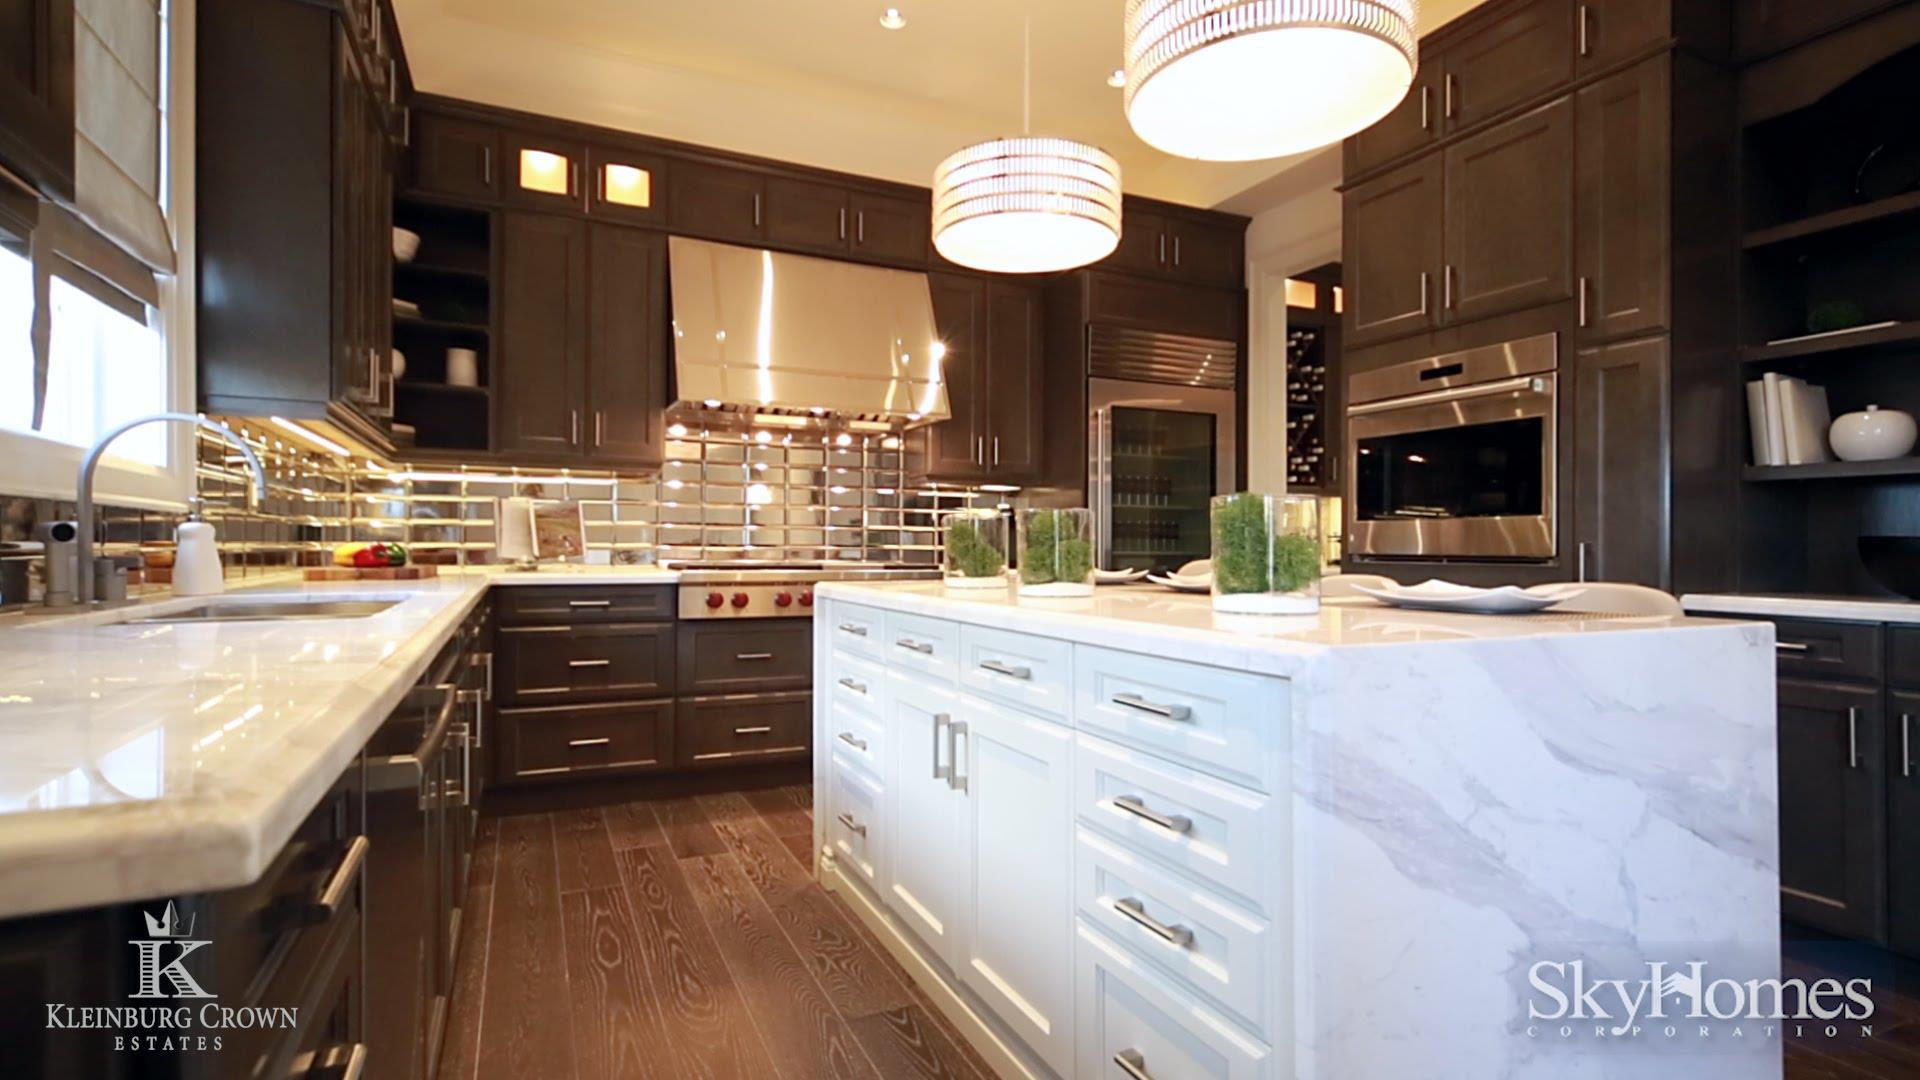 Kleinburg Crown Estates kitchen